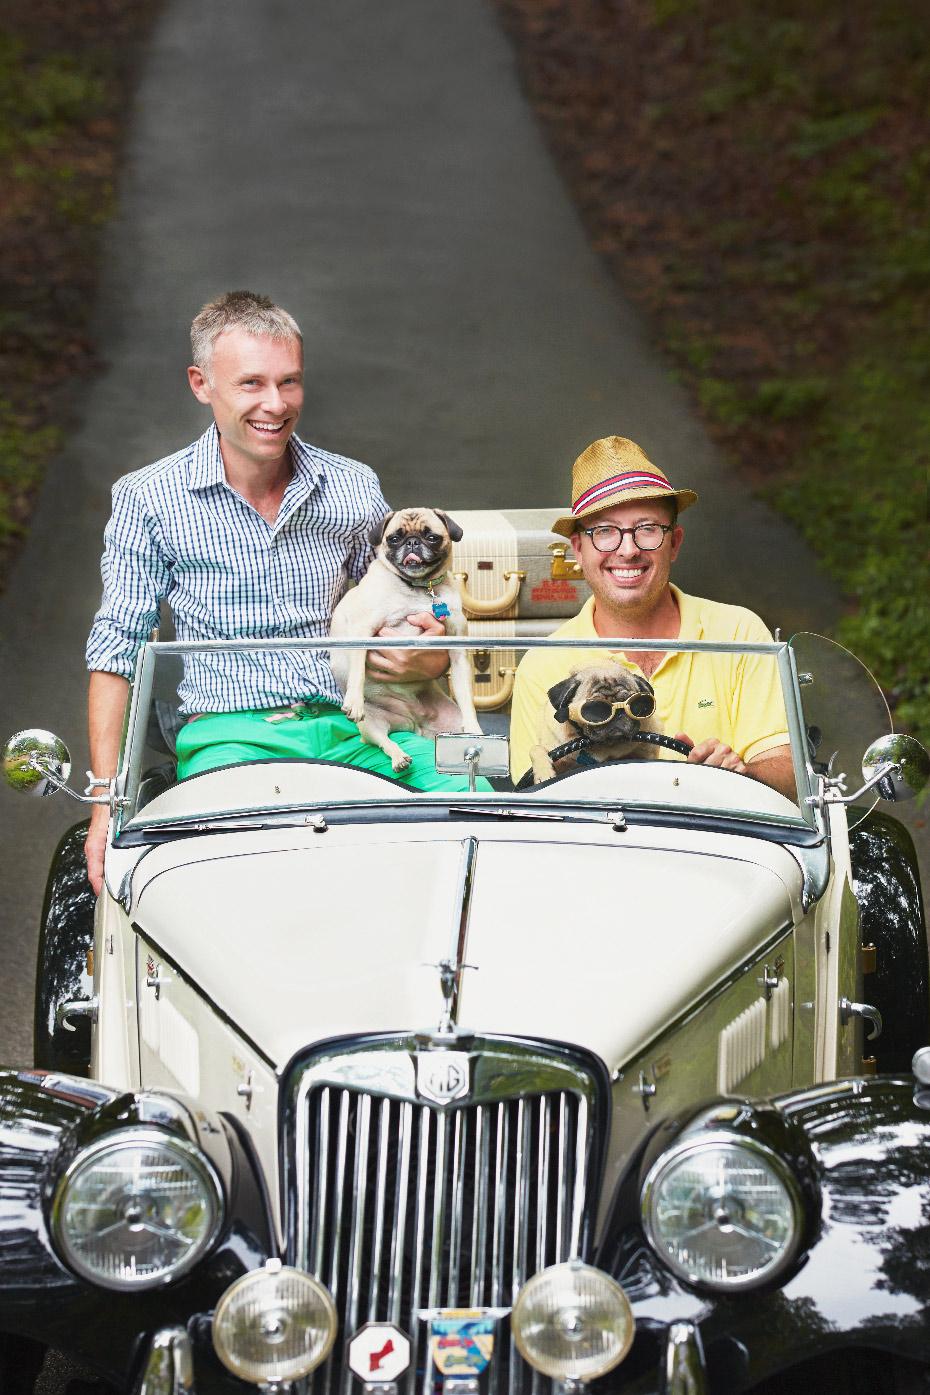 Stacey Van Berkel Photography I Mad Cap Cottage guys with pugs in vintage car I Jason Oliver Nixon & John Loecke I High Point, North Carolina